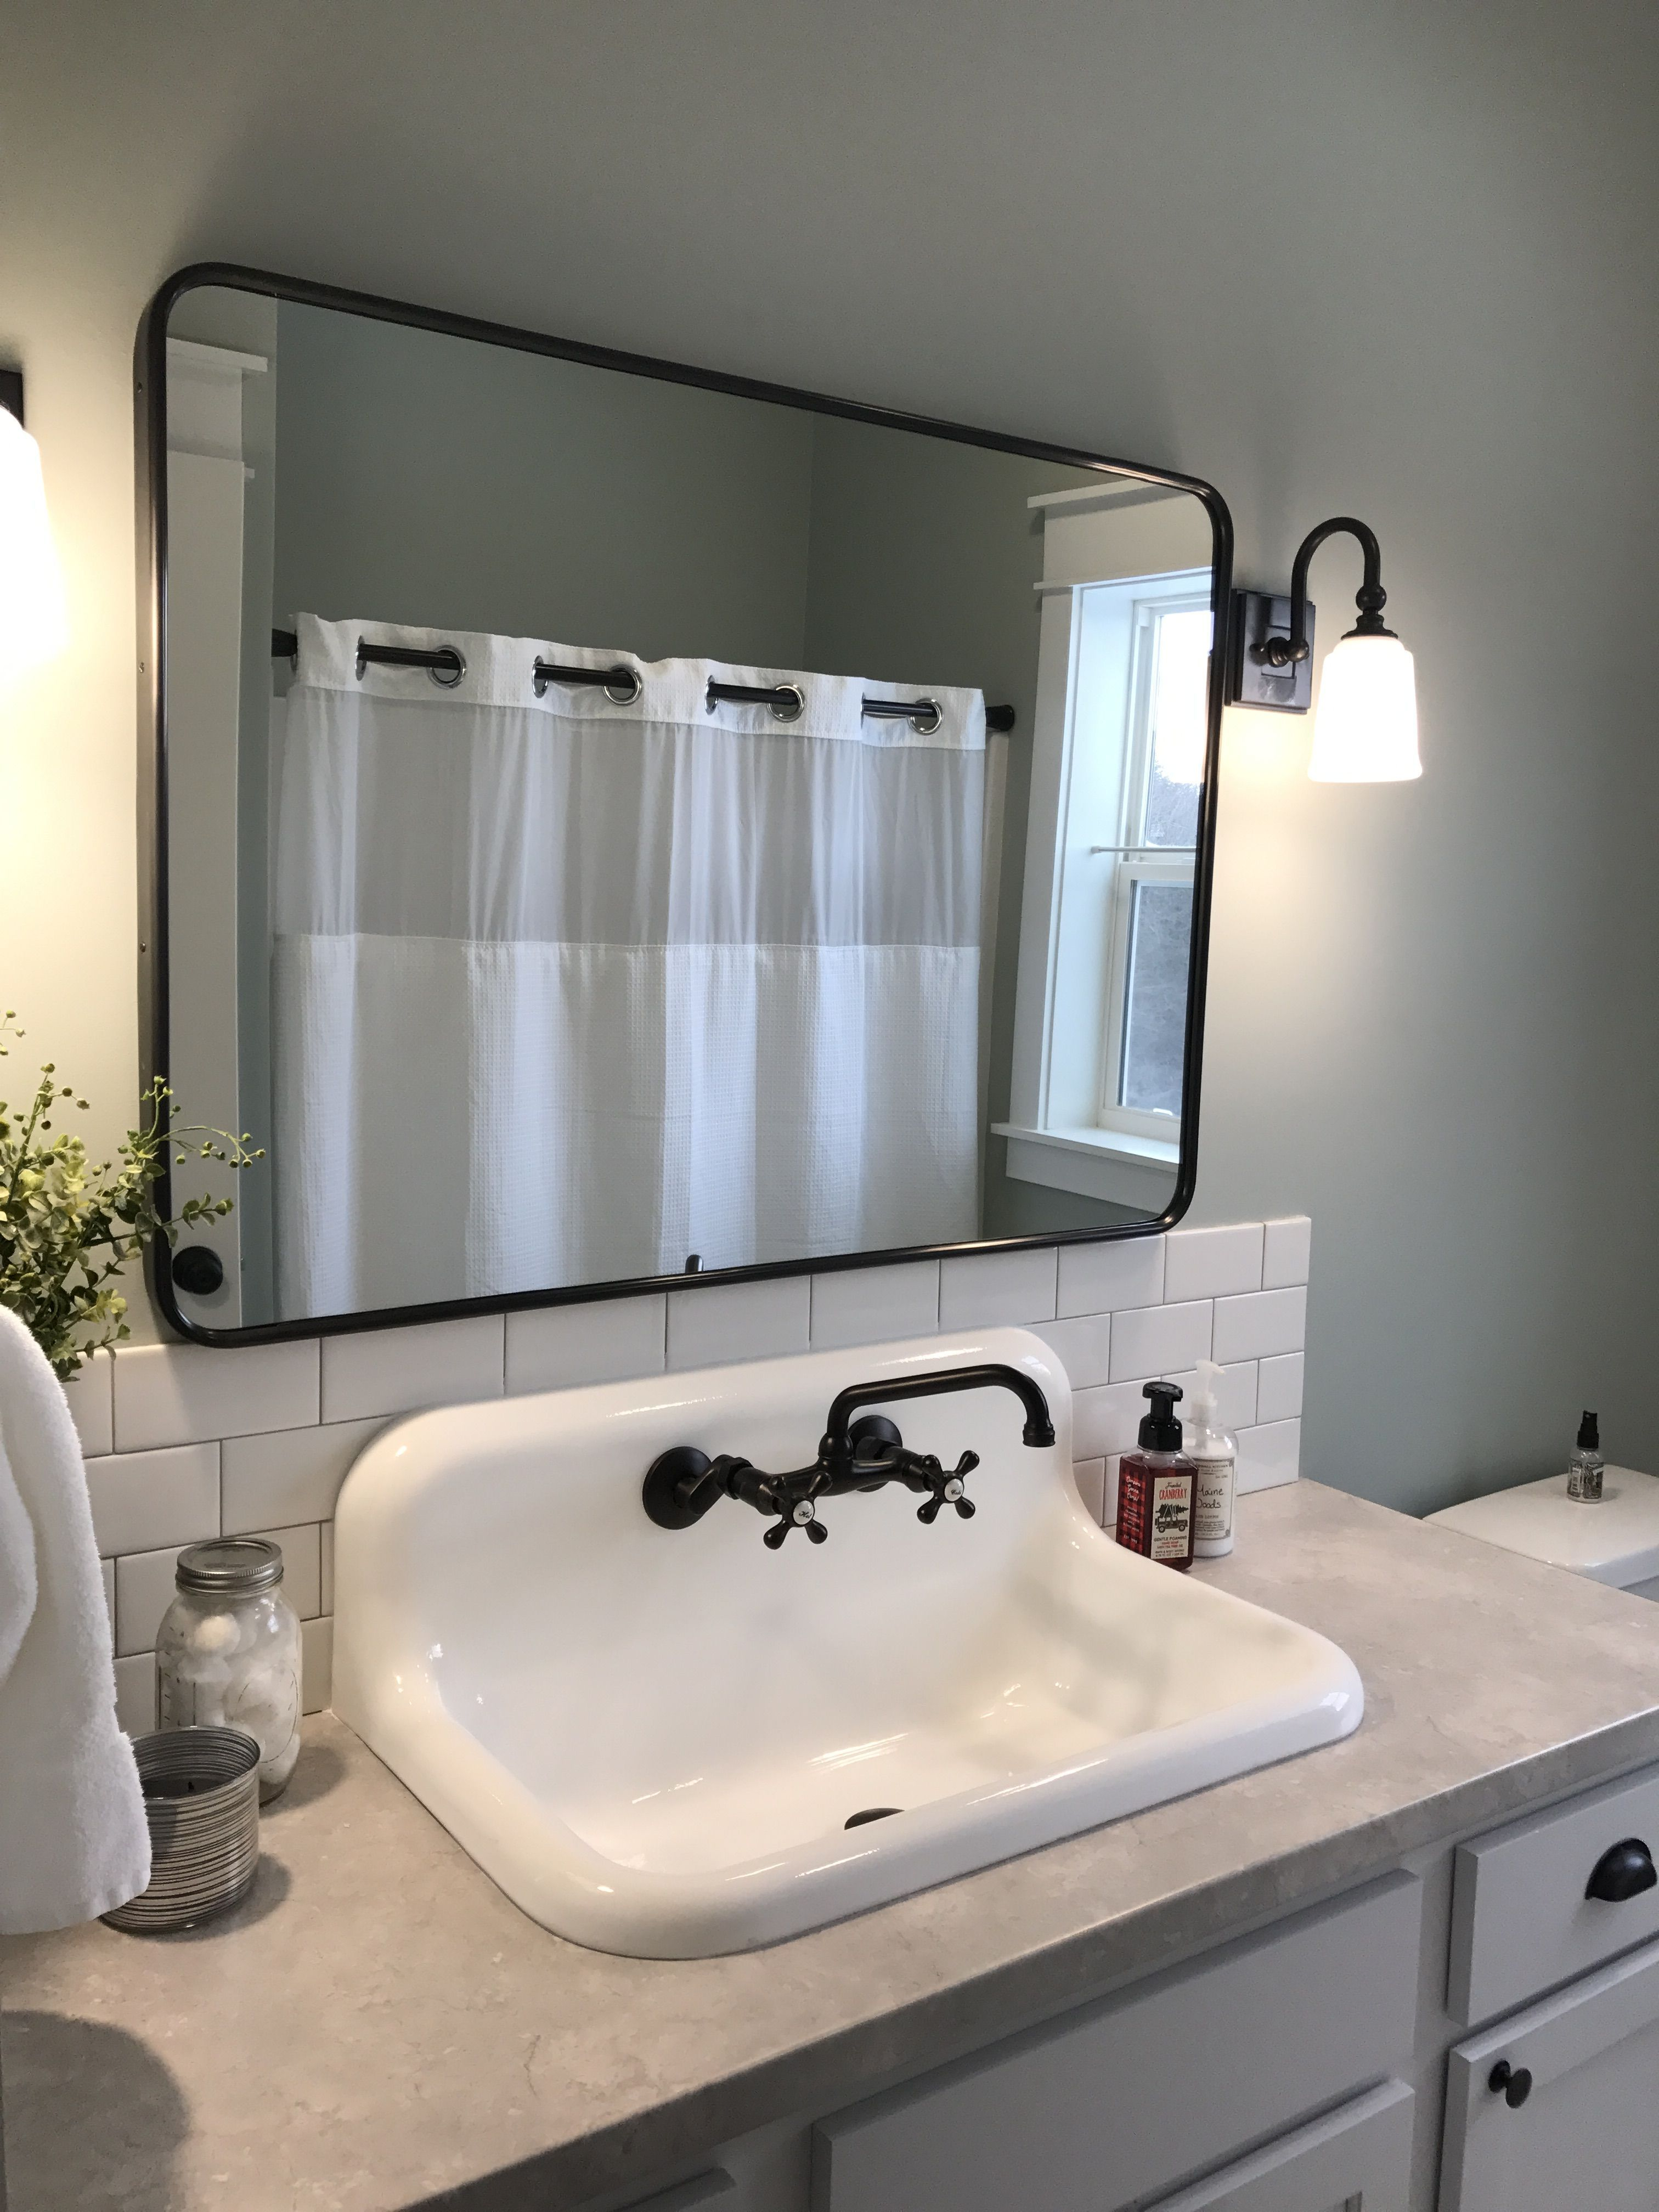 10 Impressive Rustic Diy Sink Vanity Farmhouse Style Farmhouse